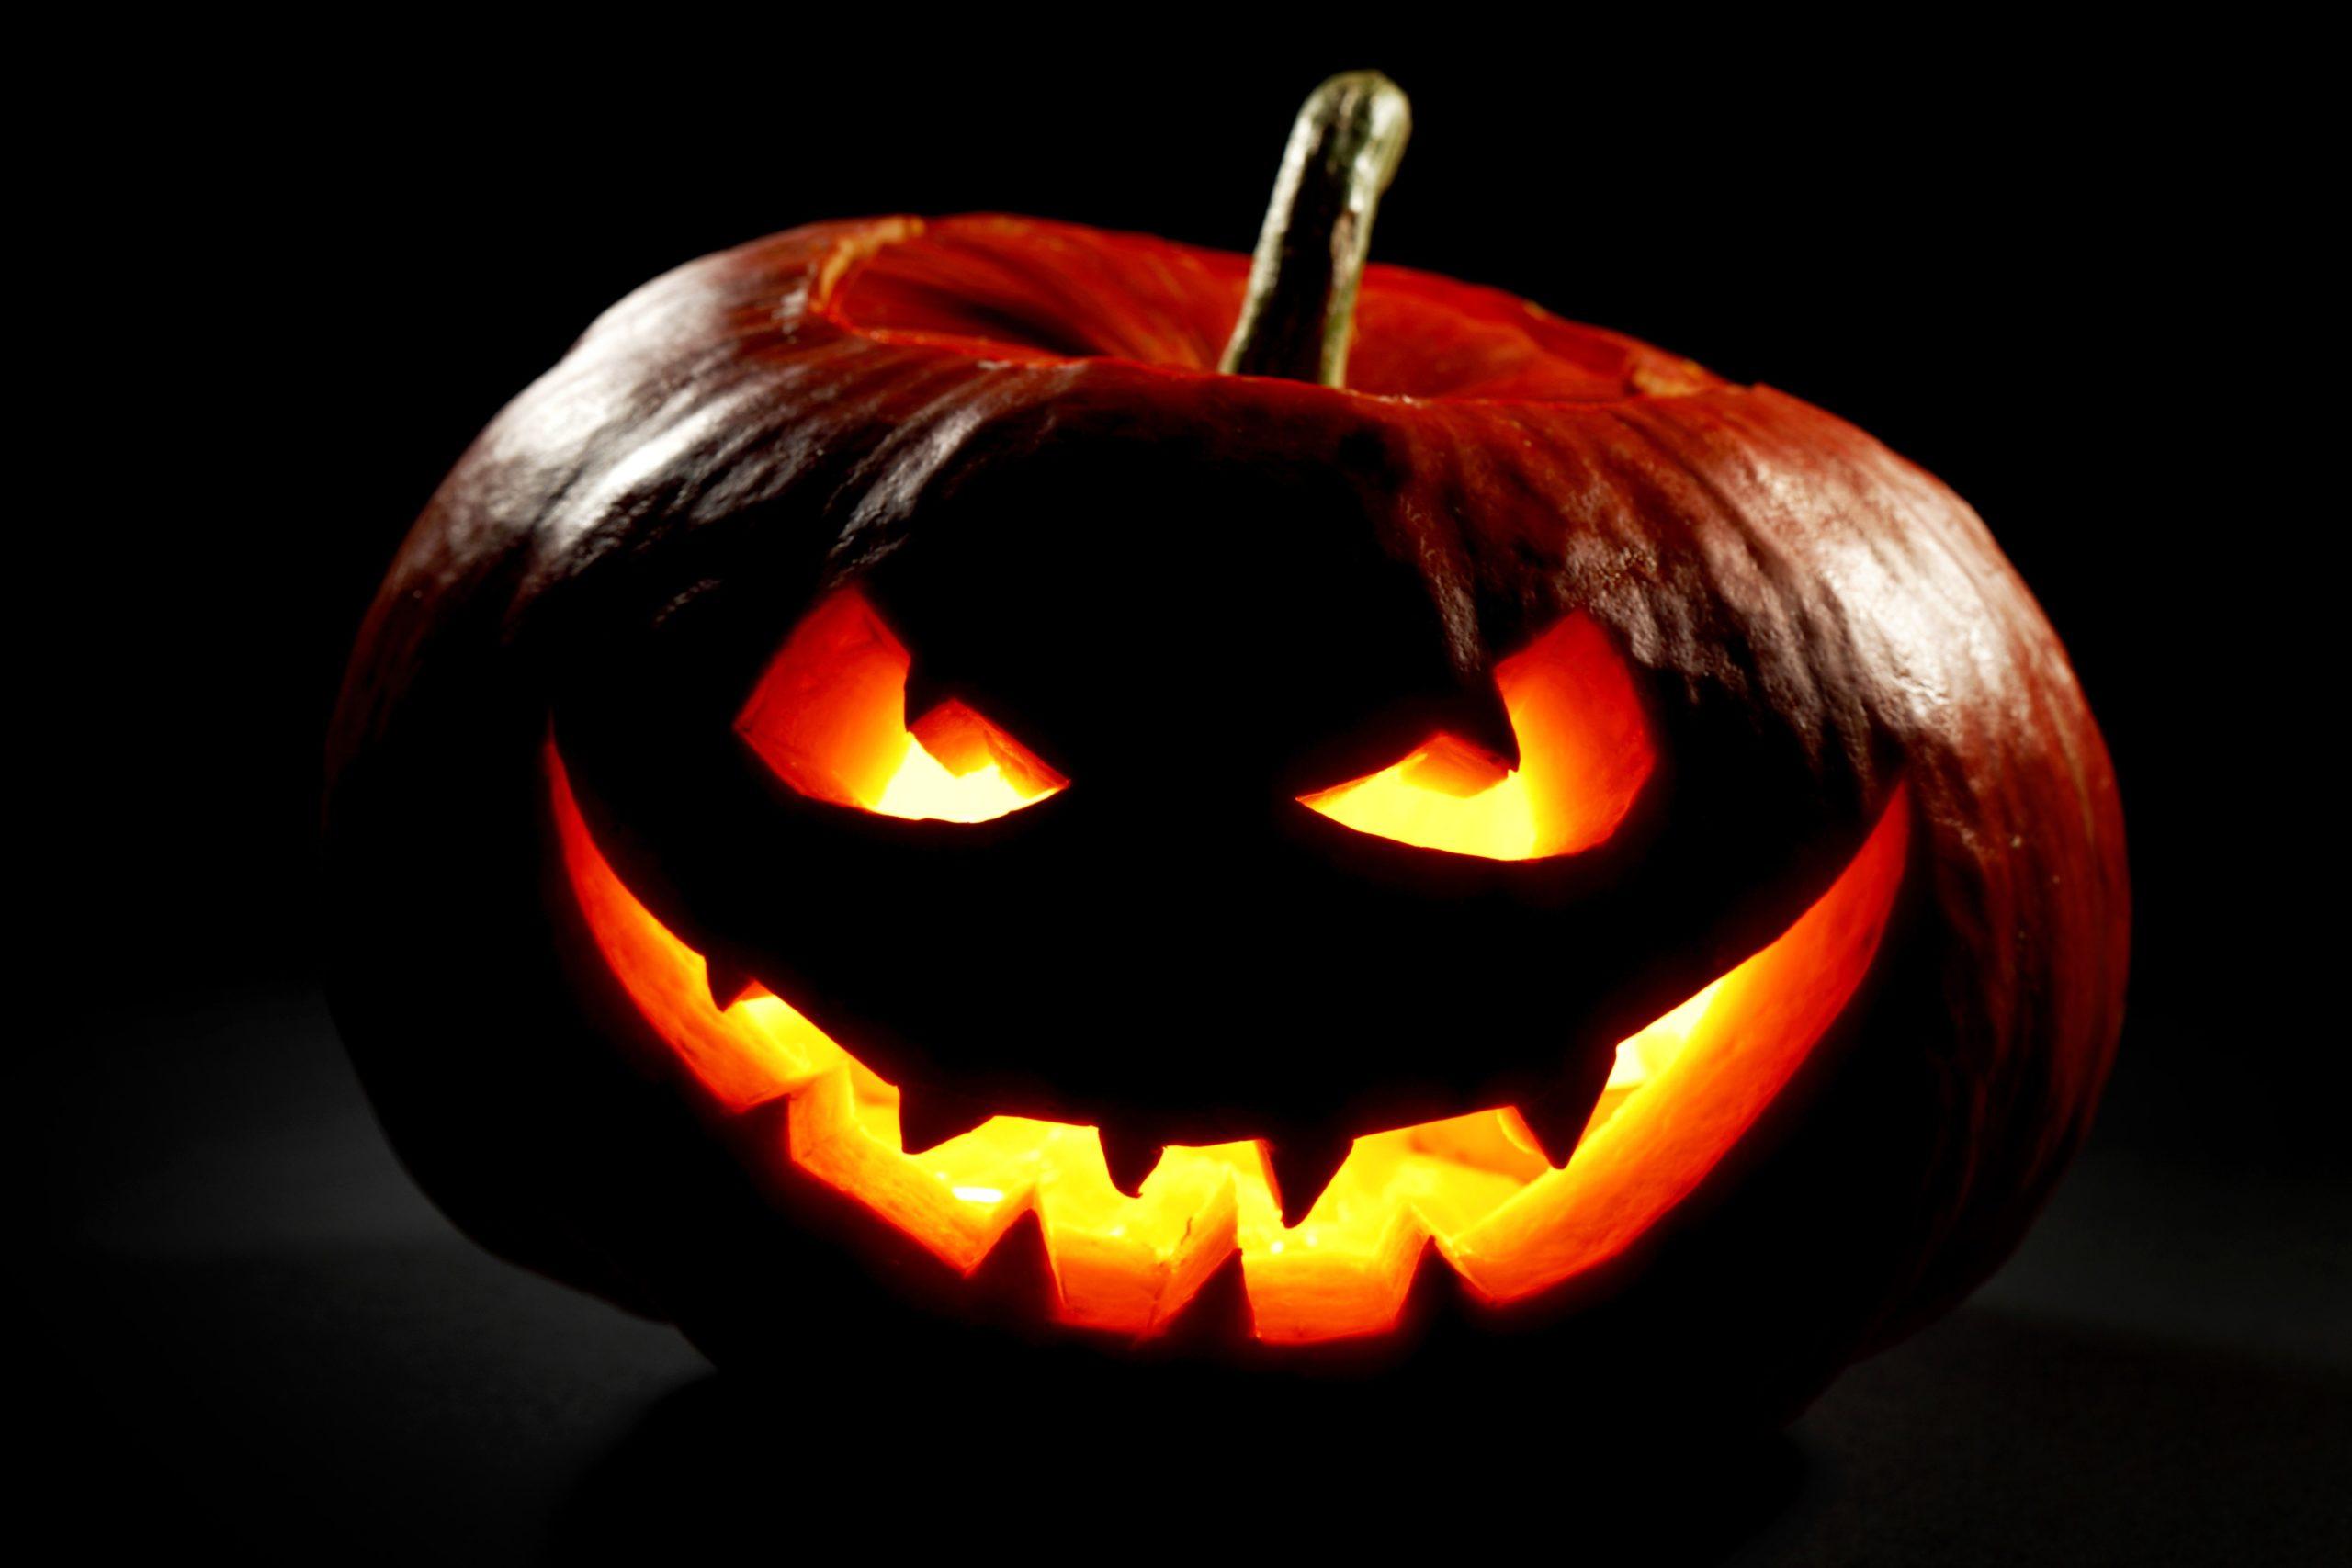 тыква на хэллоуин страшная